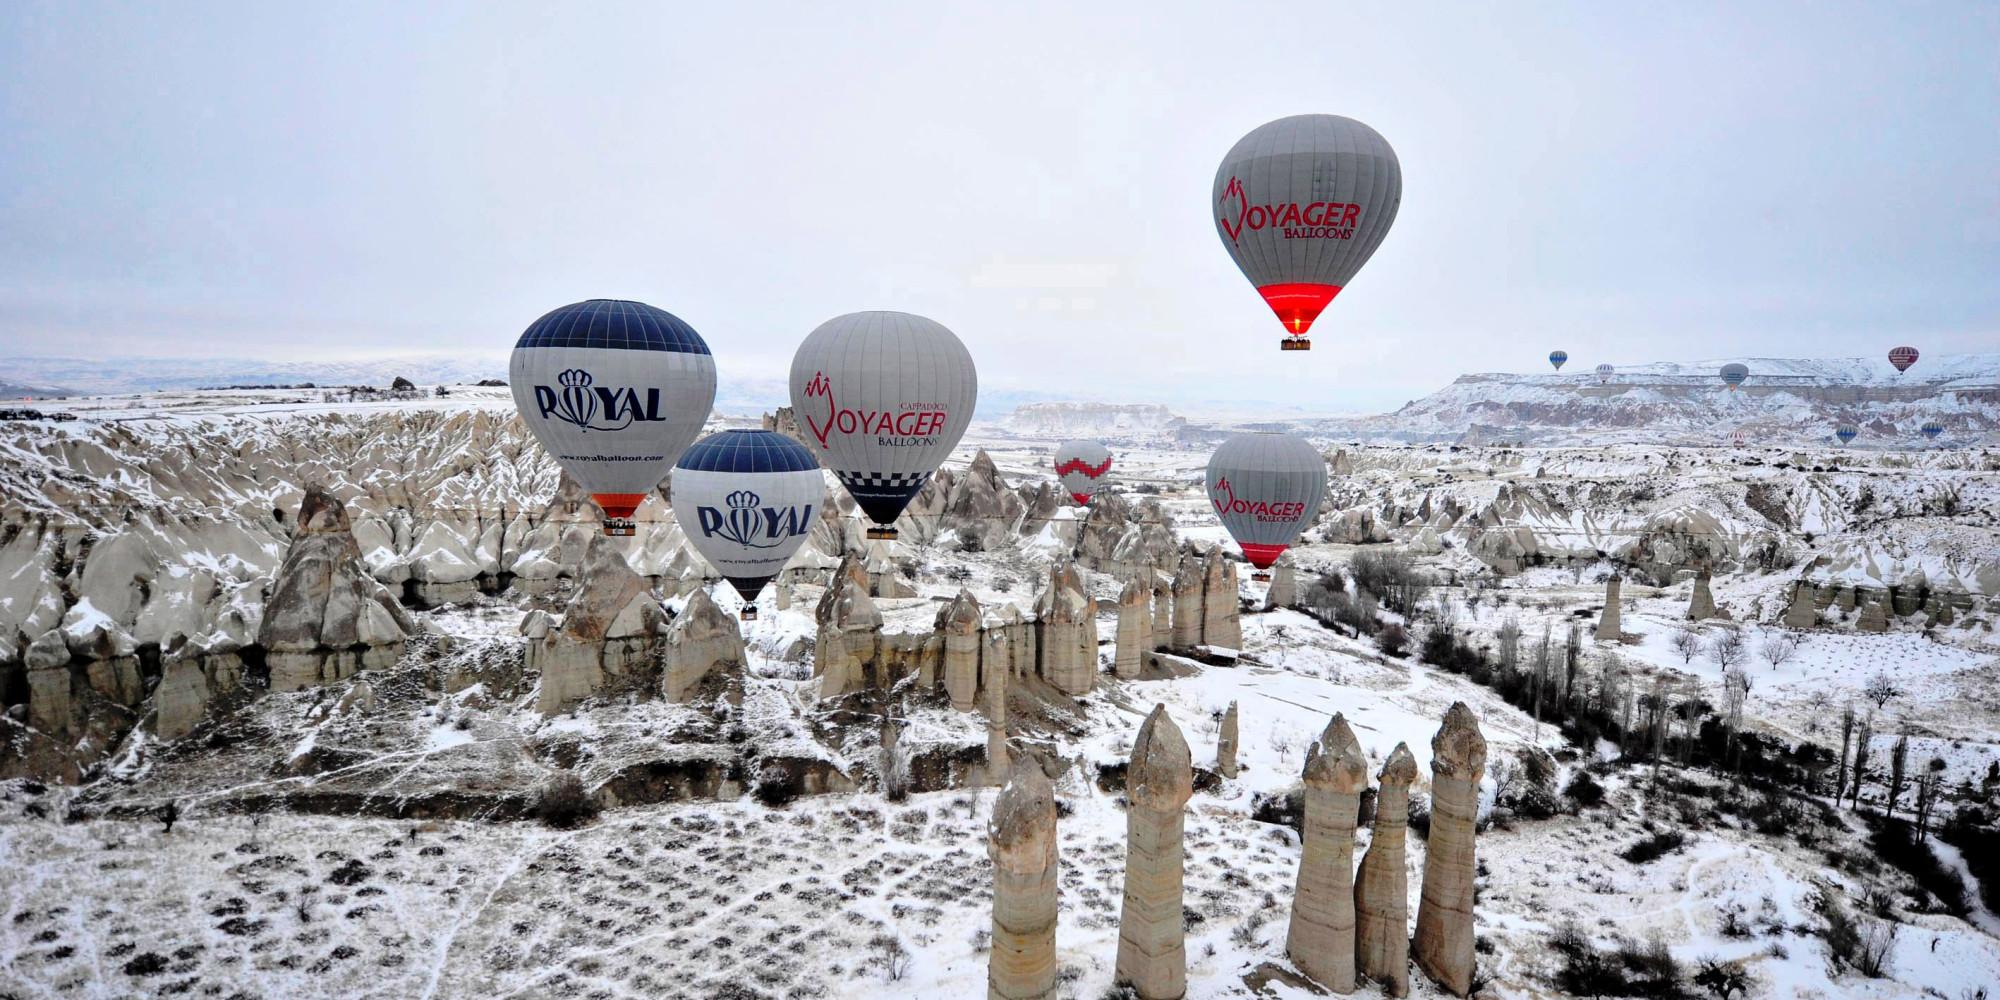 Hot Air Balloon In Cappadocia Turkey On This Travel